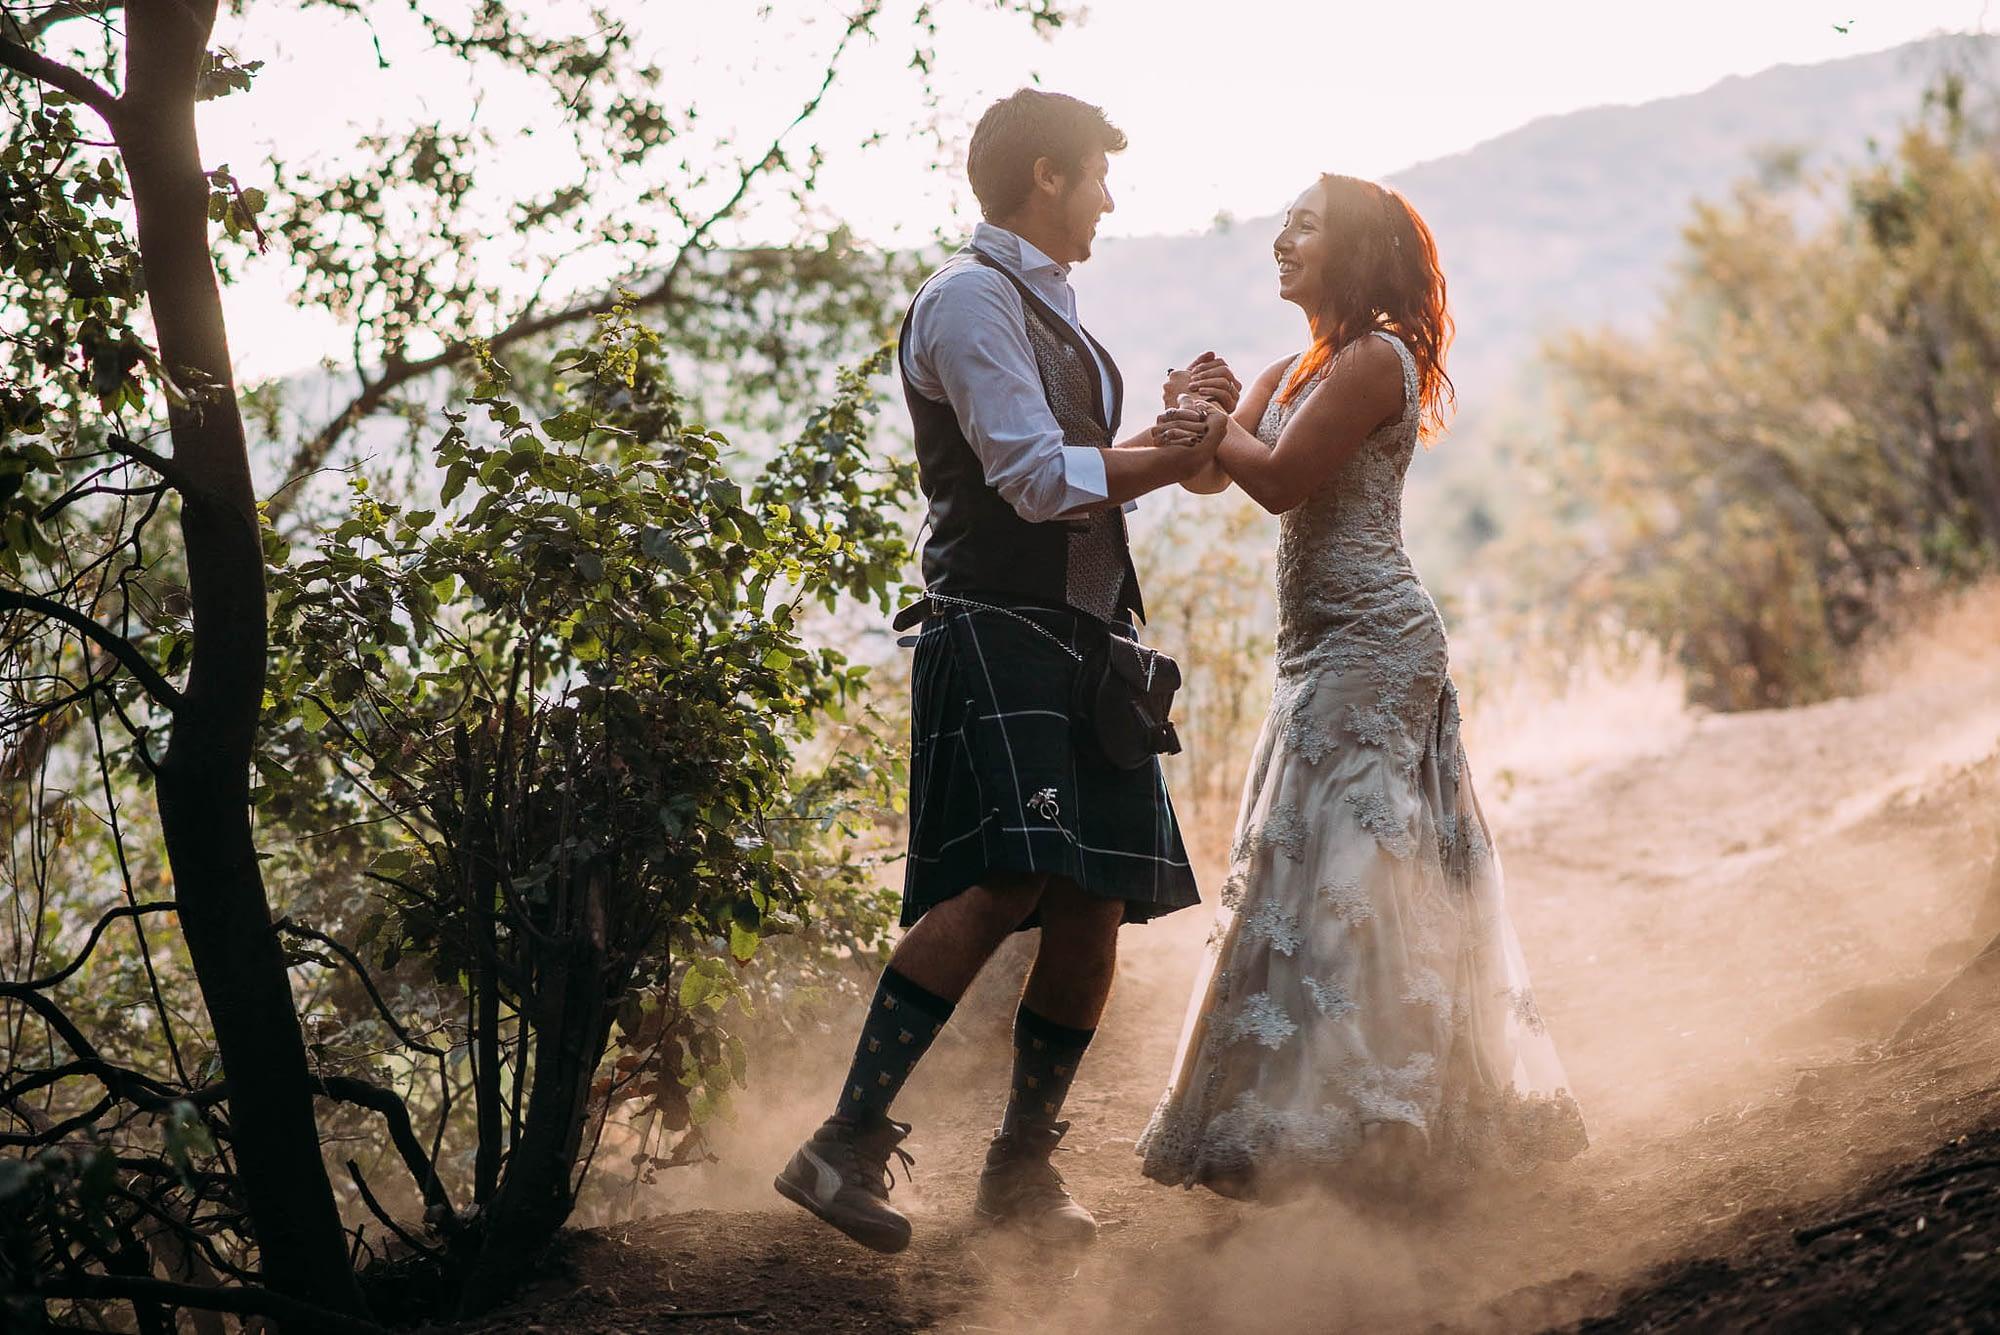 santuario de la naturaleza el arrayan-escalada-fotografo de matrimonios santiago